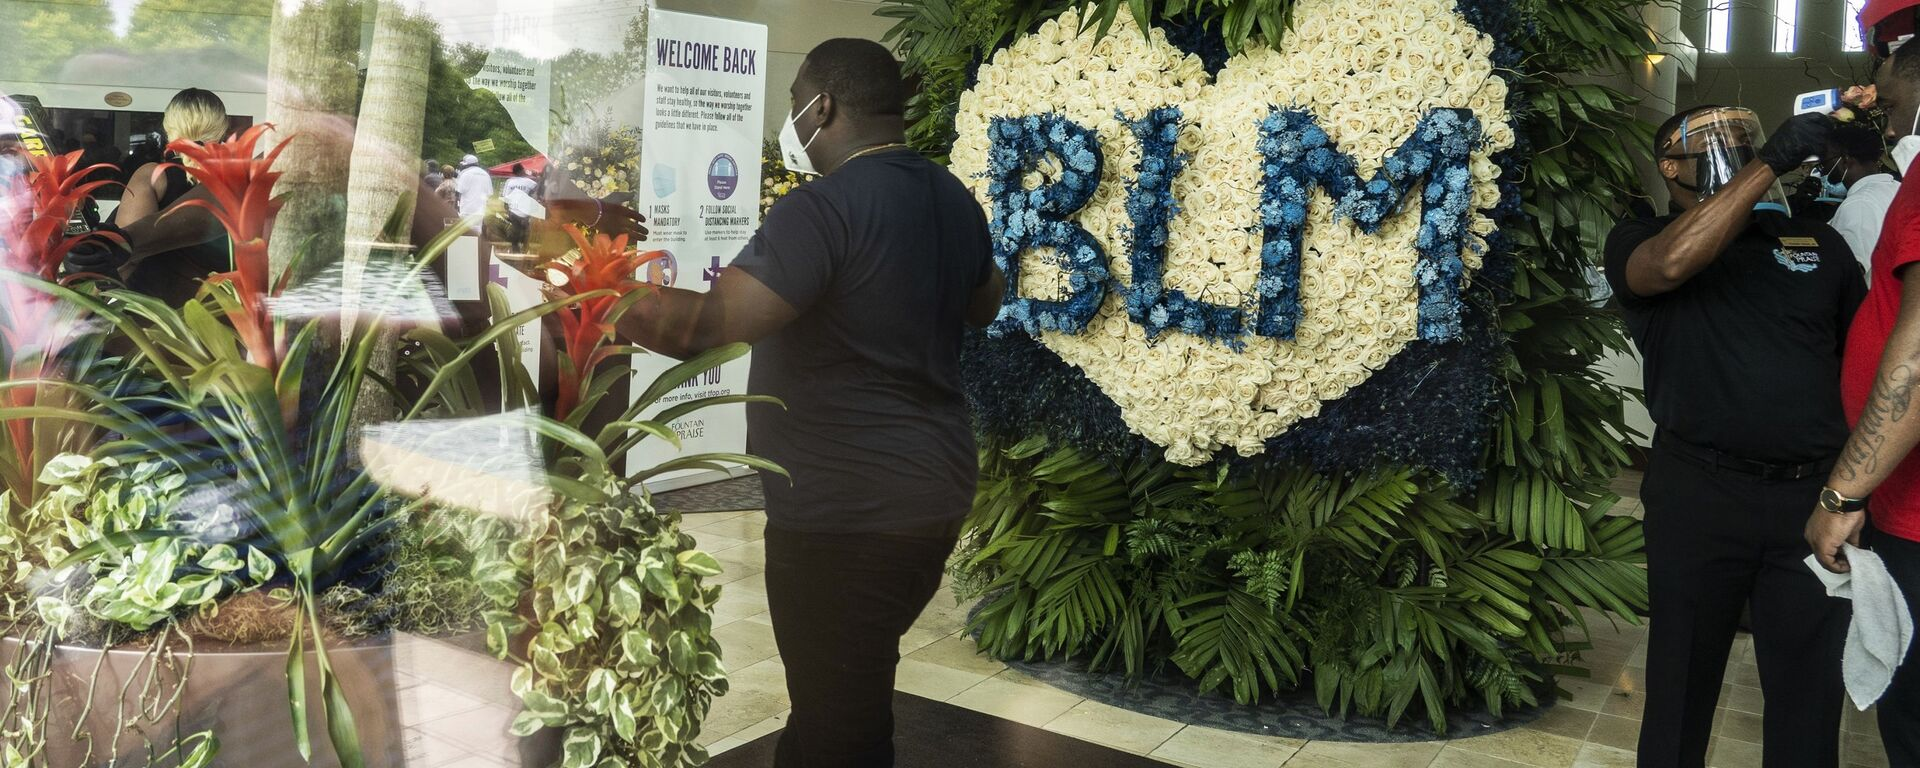 Венок BLM (black lives matter) в церкви The Fountain of Praise в Хьюстоне на церемонии прощания с афроамериканцем Джорджем Флойдом - Sputnik Армения, 1920, 23.12.2020